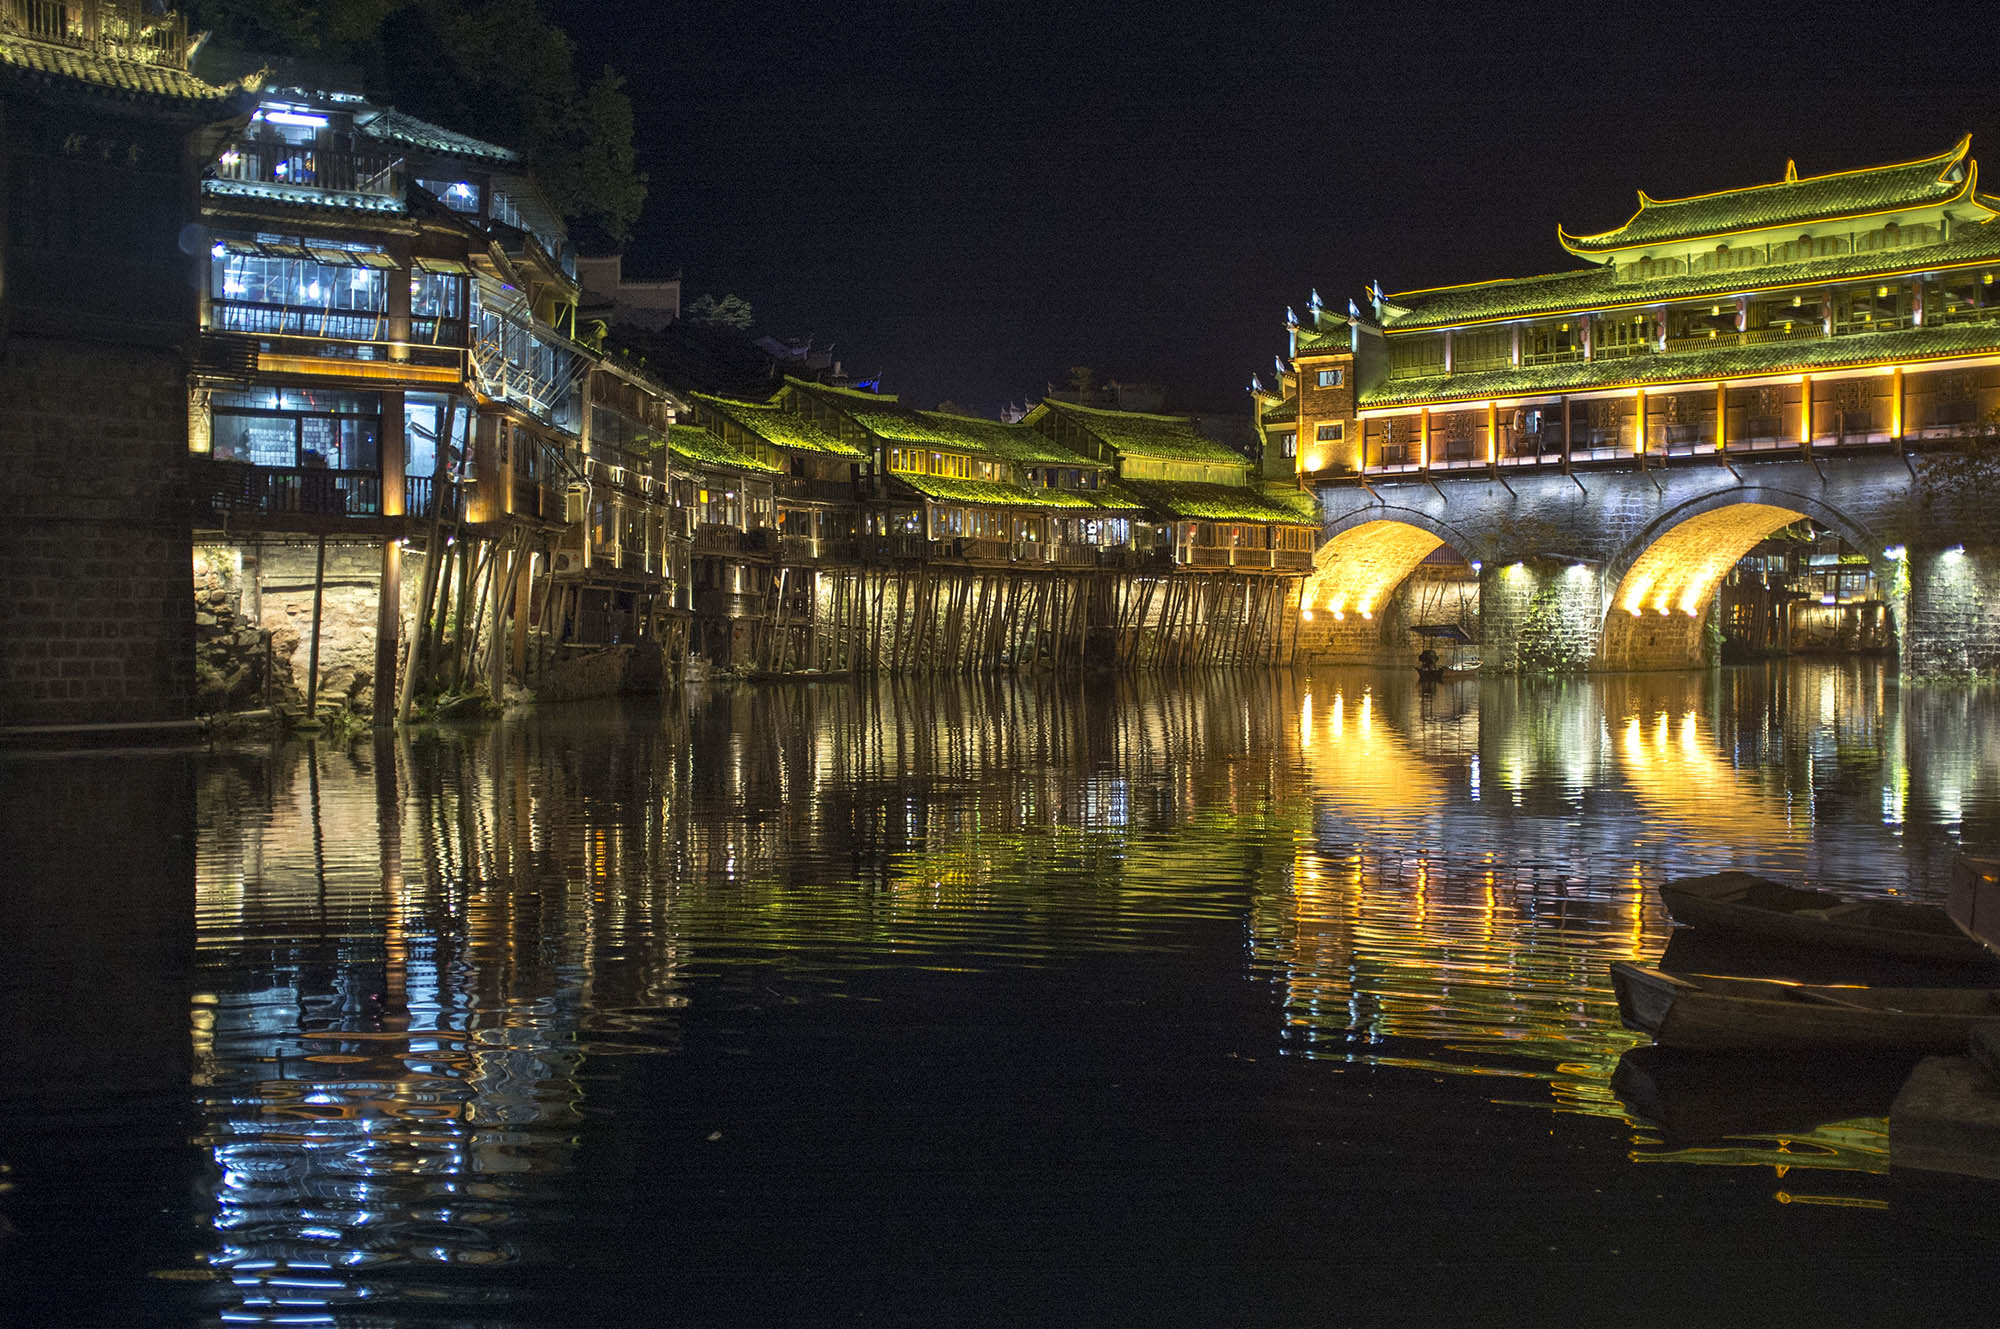 Covered bridge at night.